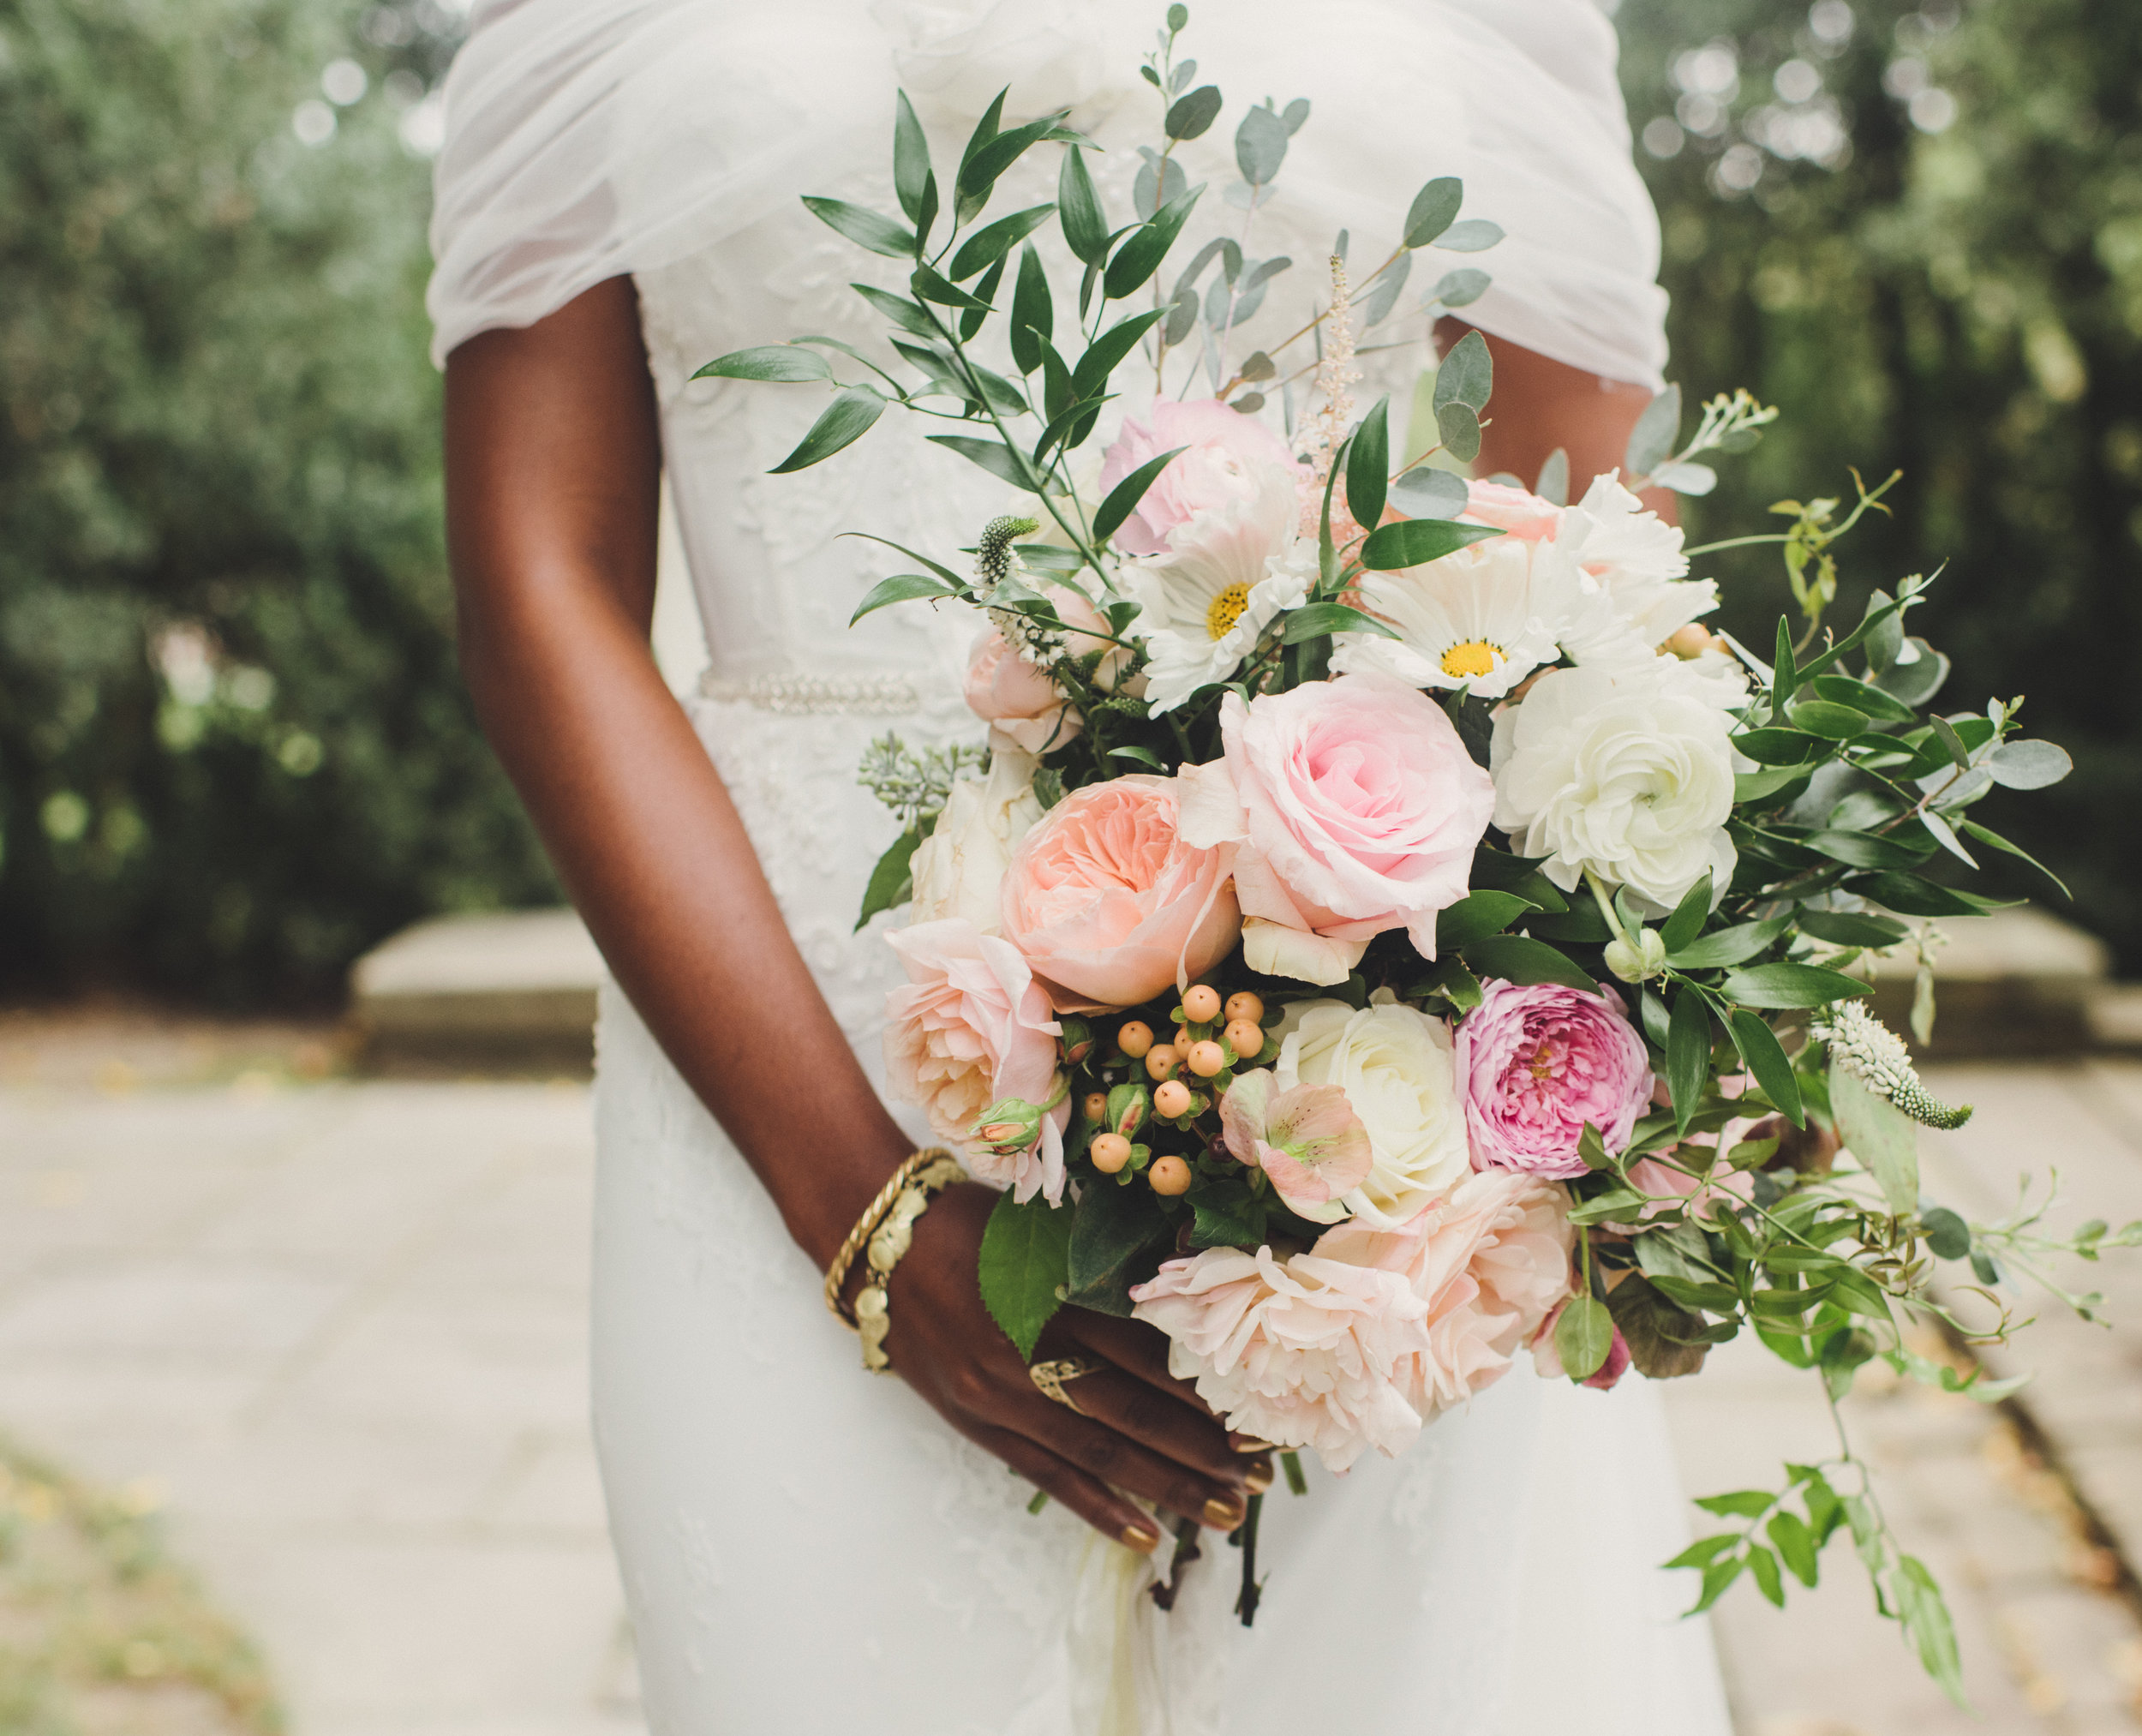 GLENVIEW MANSION WEDDING - INTIMATE WEDDING PHOTOGRAPHER - TWOTWENTY by CHI-CHI AGBIM-147.jpg